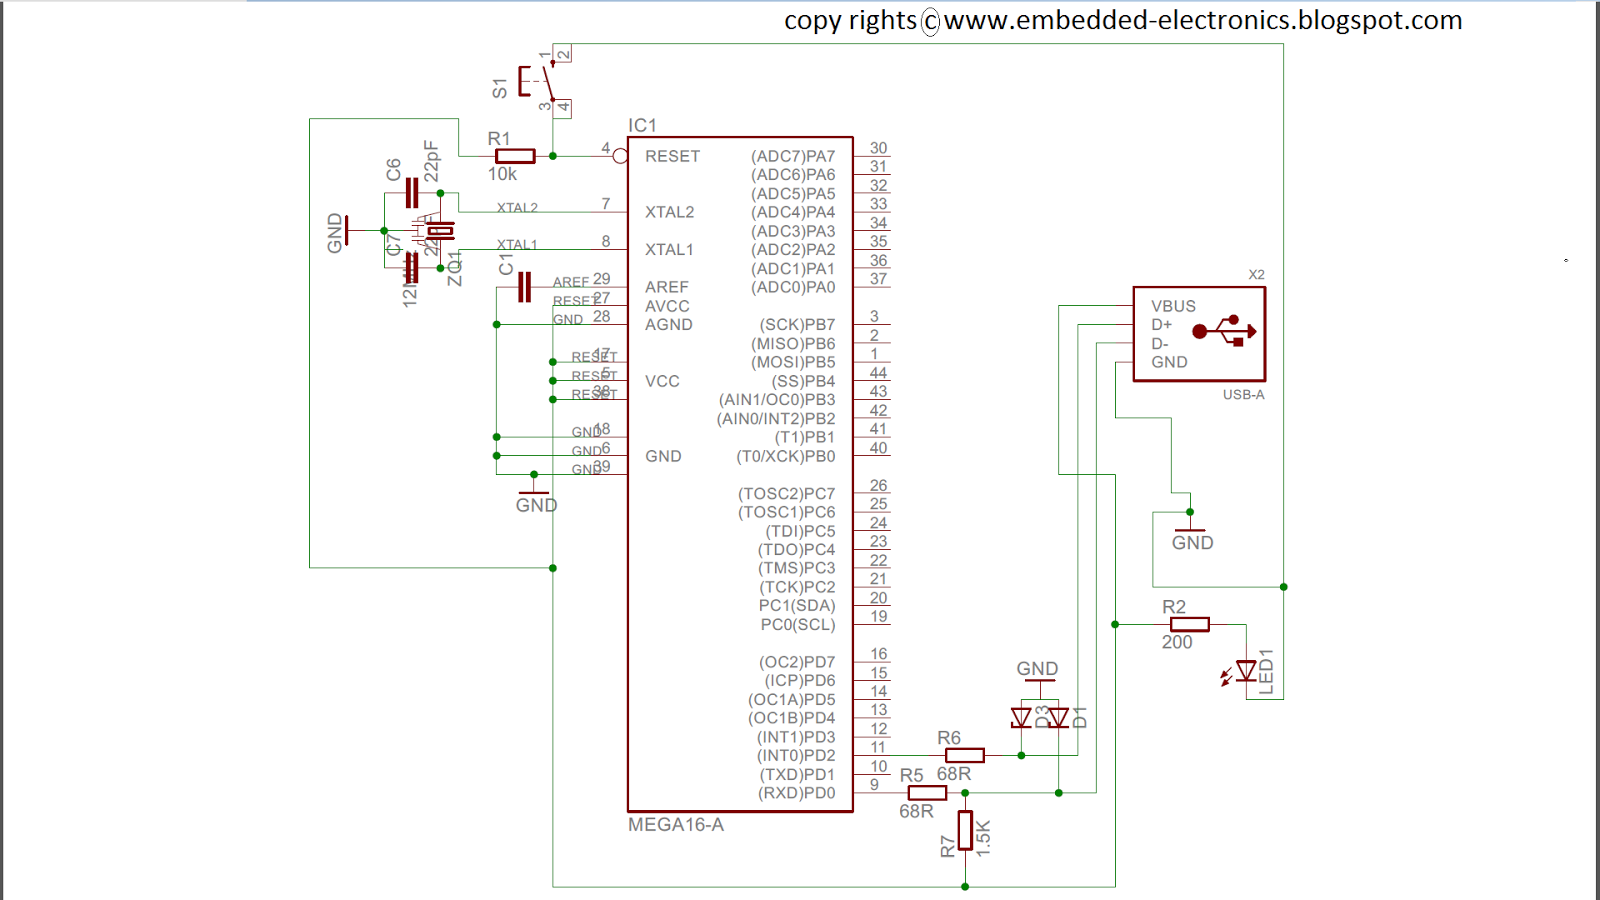 Embedded Electronics 11 02 14